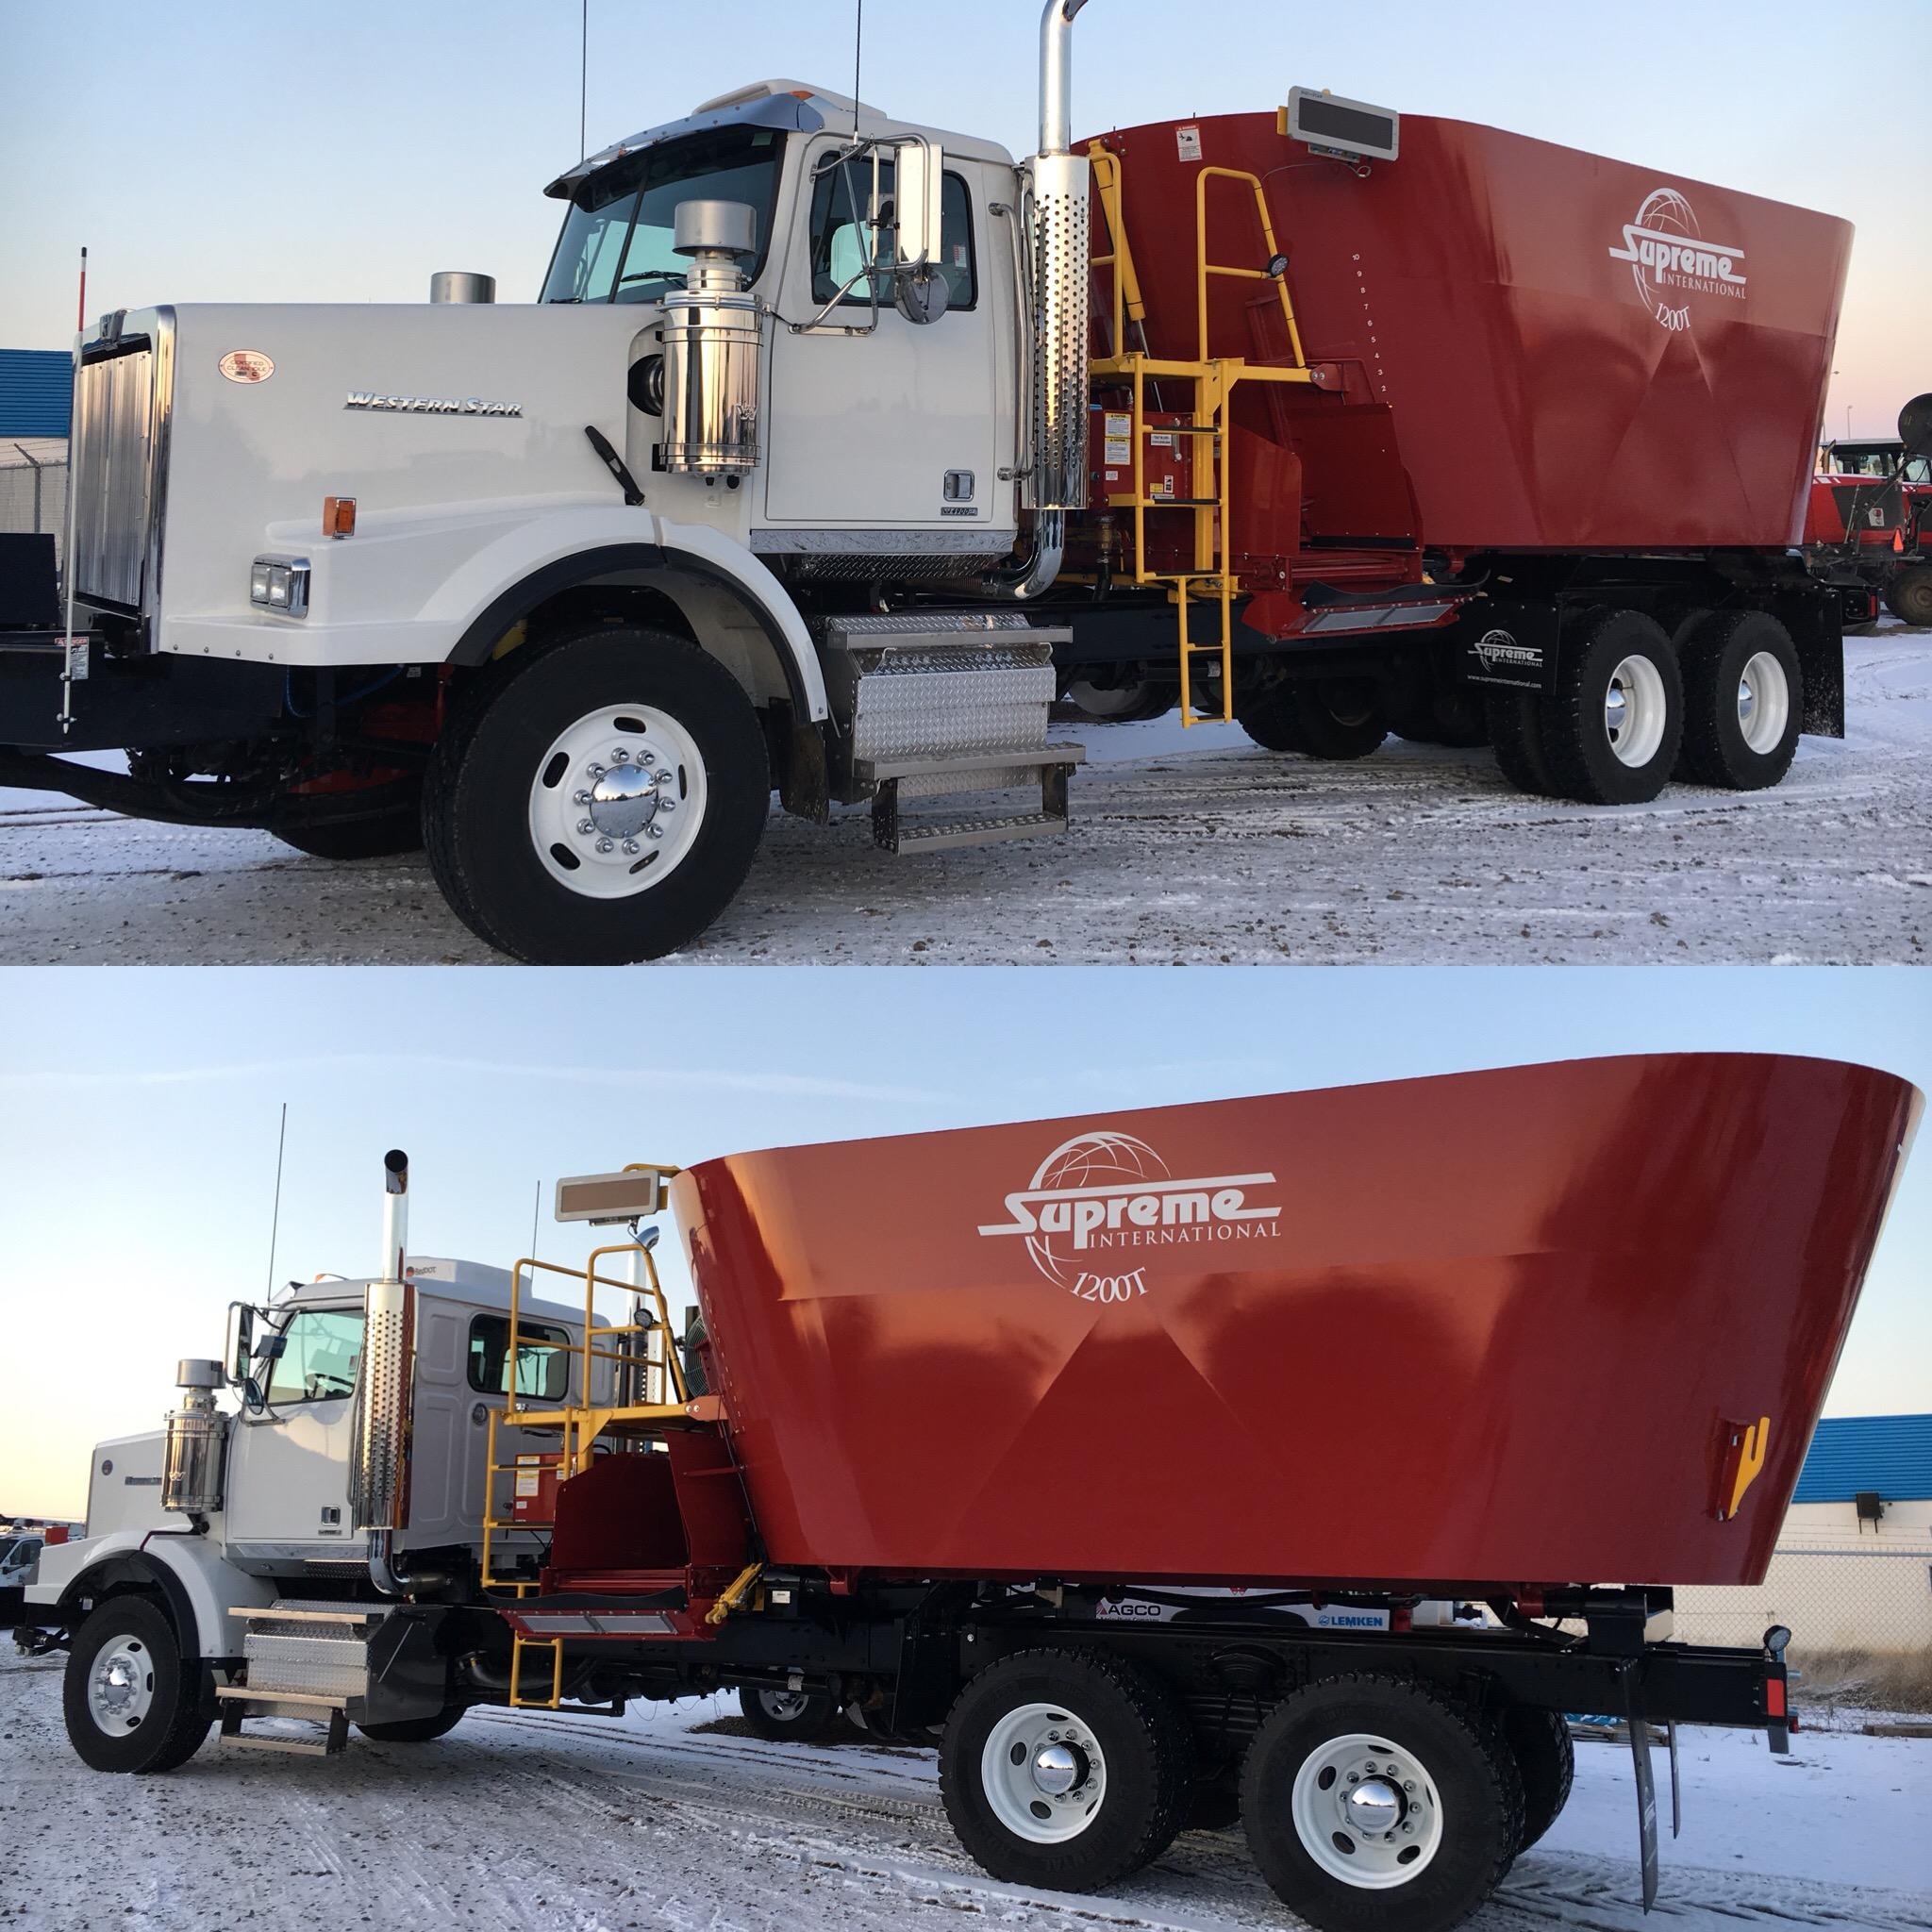 Supreme 1200T Truck Mount Hydrostatic Drive